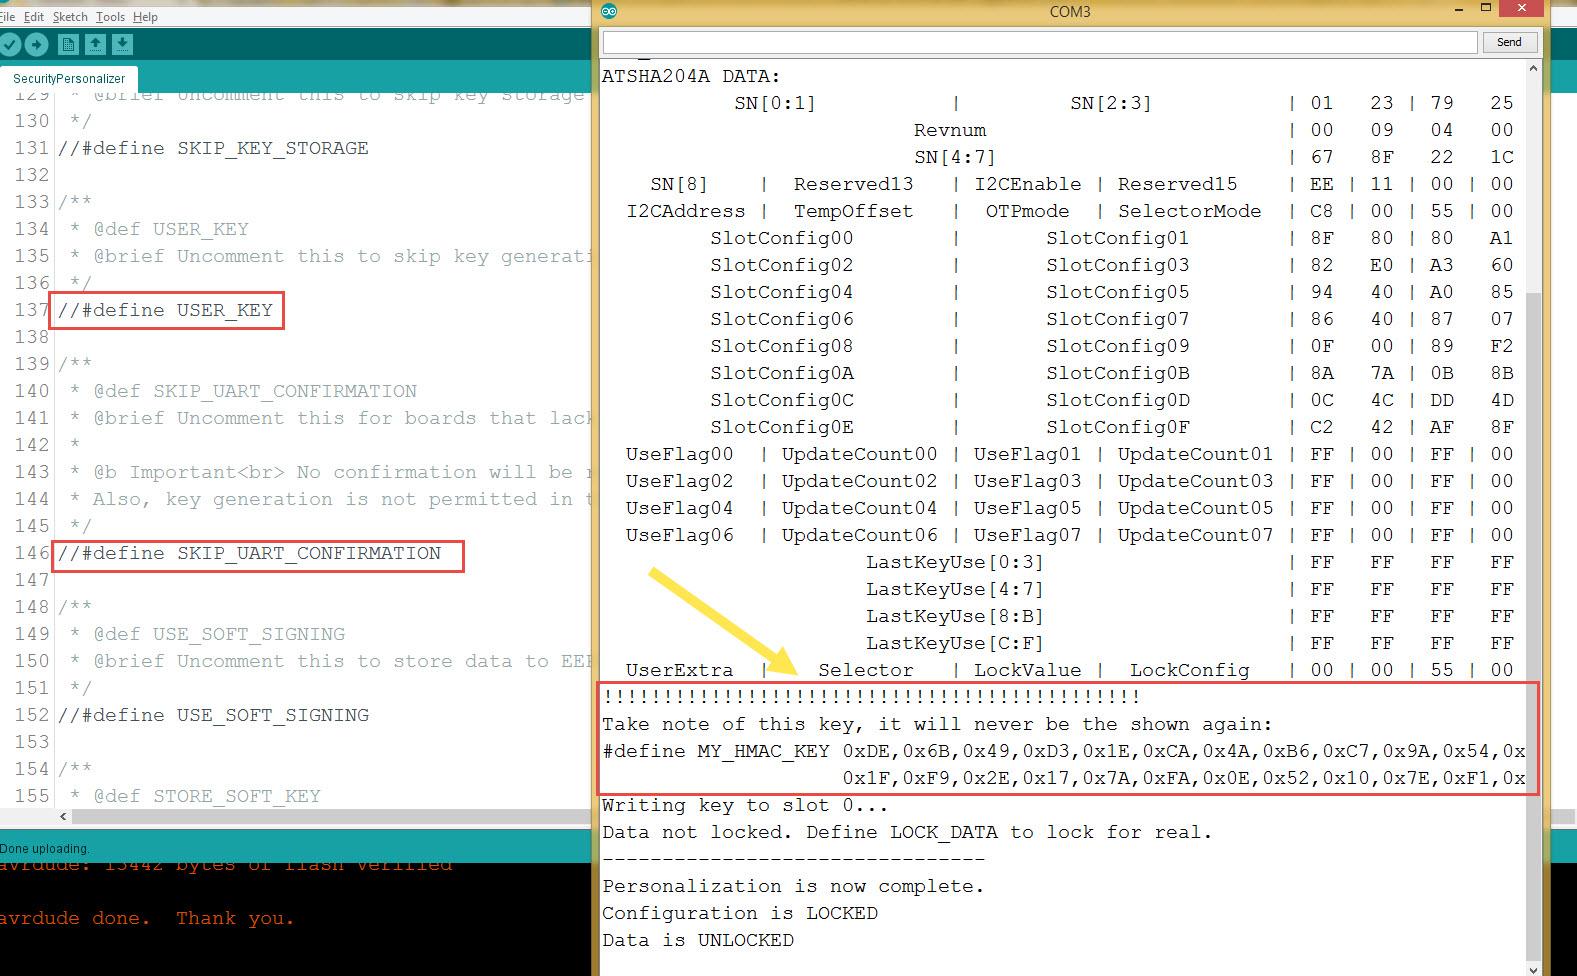 open serial monitor and copy #define MY_HMAC_KEY 0x blah blah blah